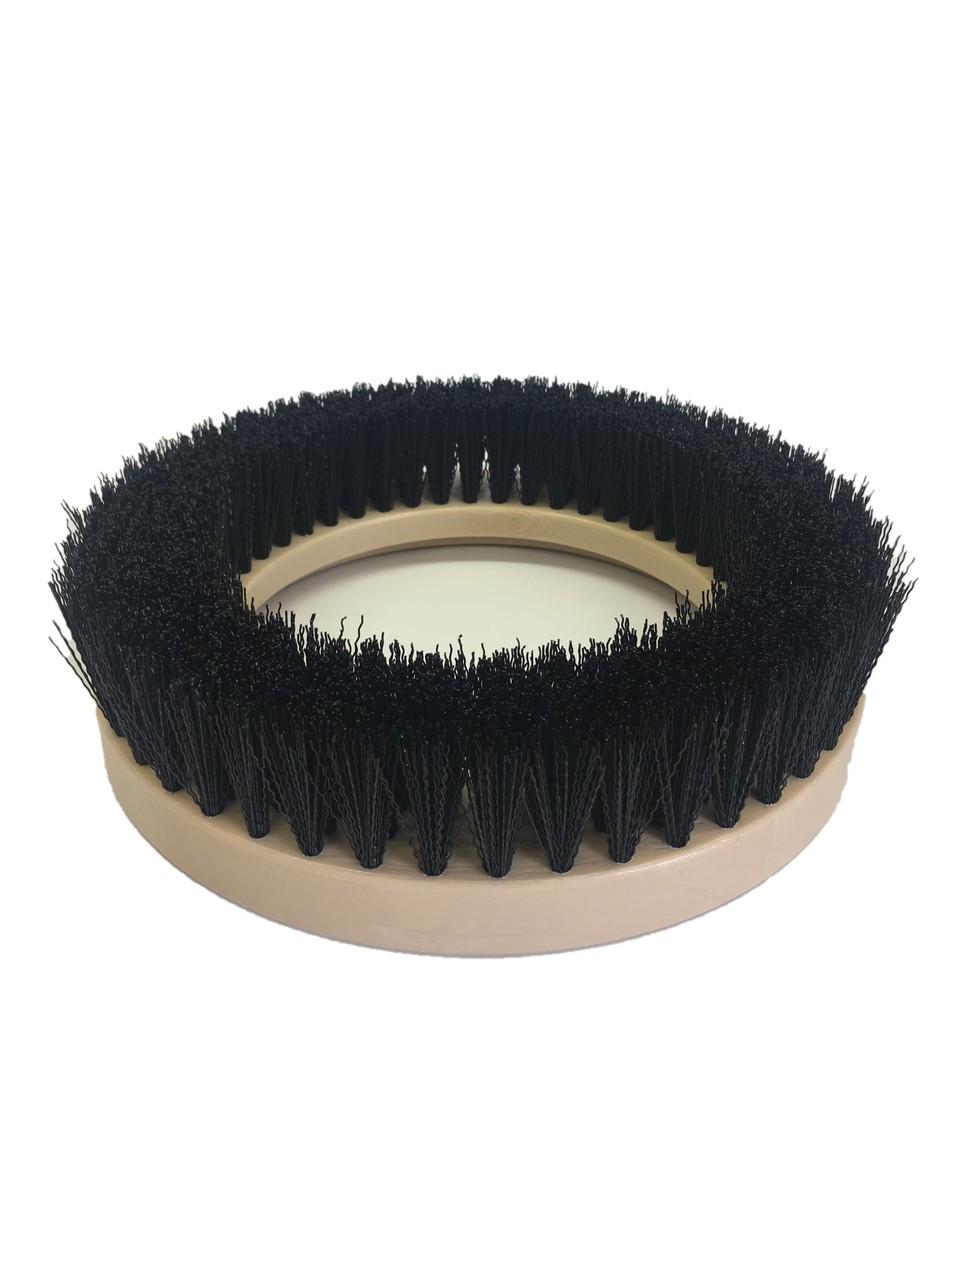 "9"" Flat Coarse Brush, 1.5"" bristle, Nylon, #3 brush alone"